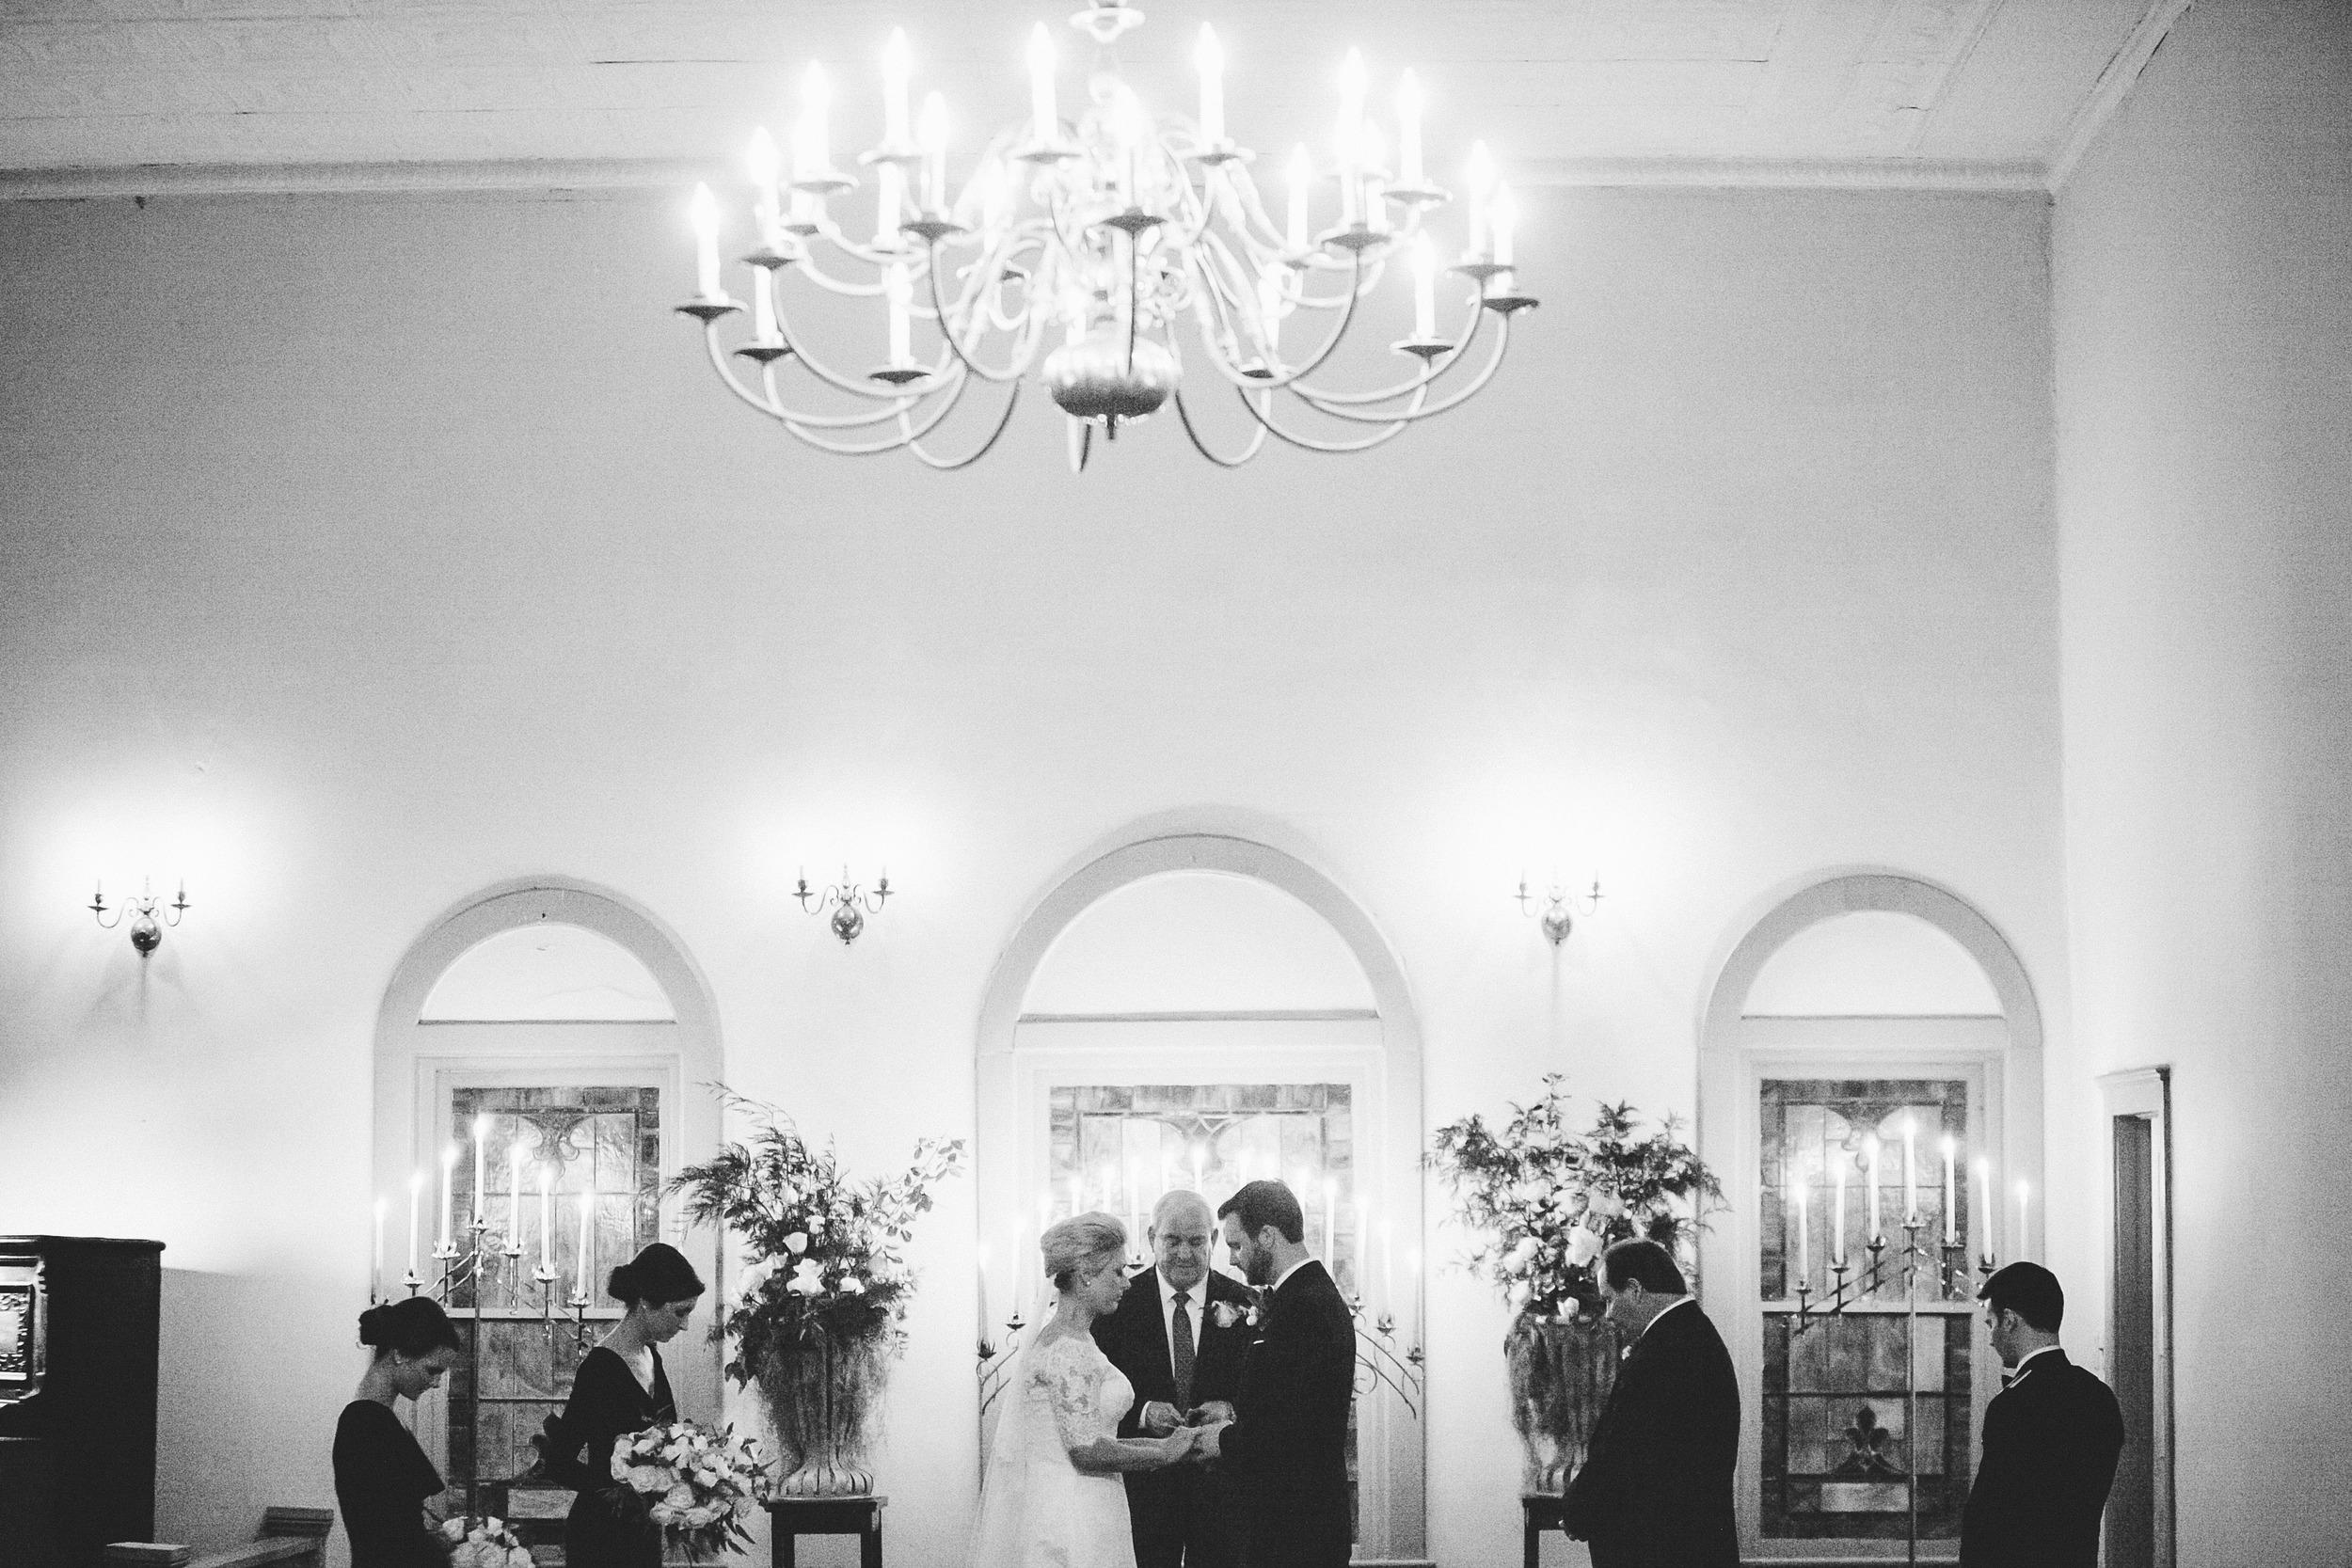 Emily + Sam's evening wedding ceremony in Stillmore, Georgia